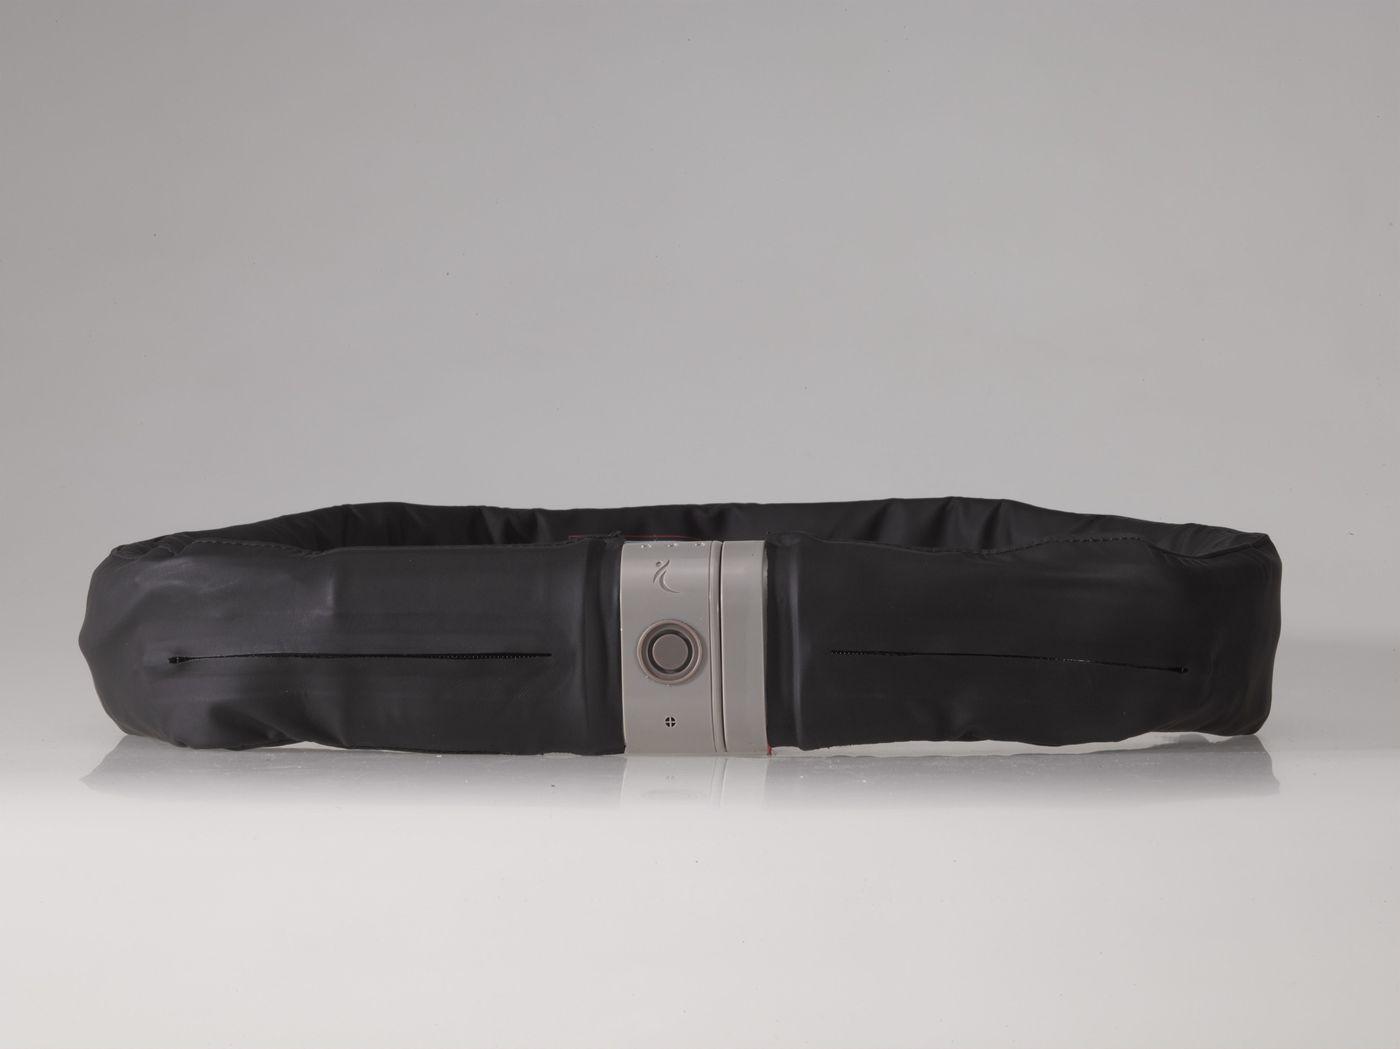 The Tango belt.